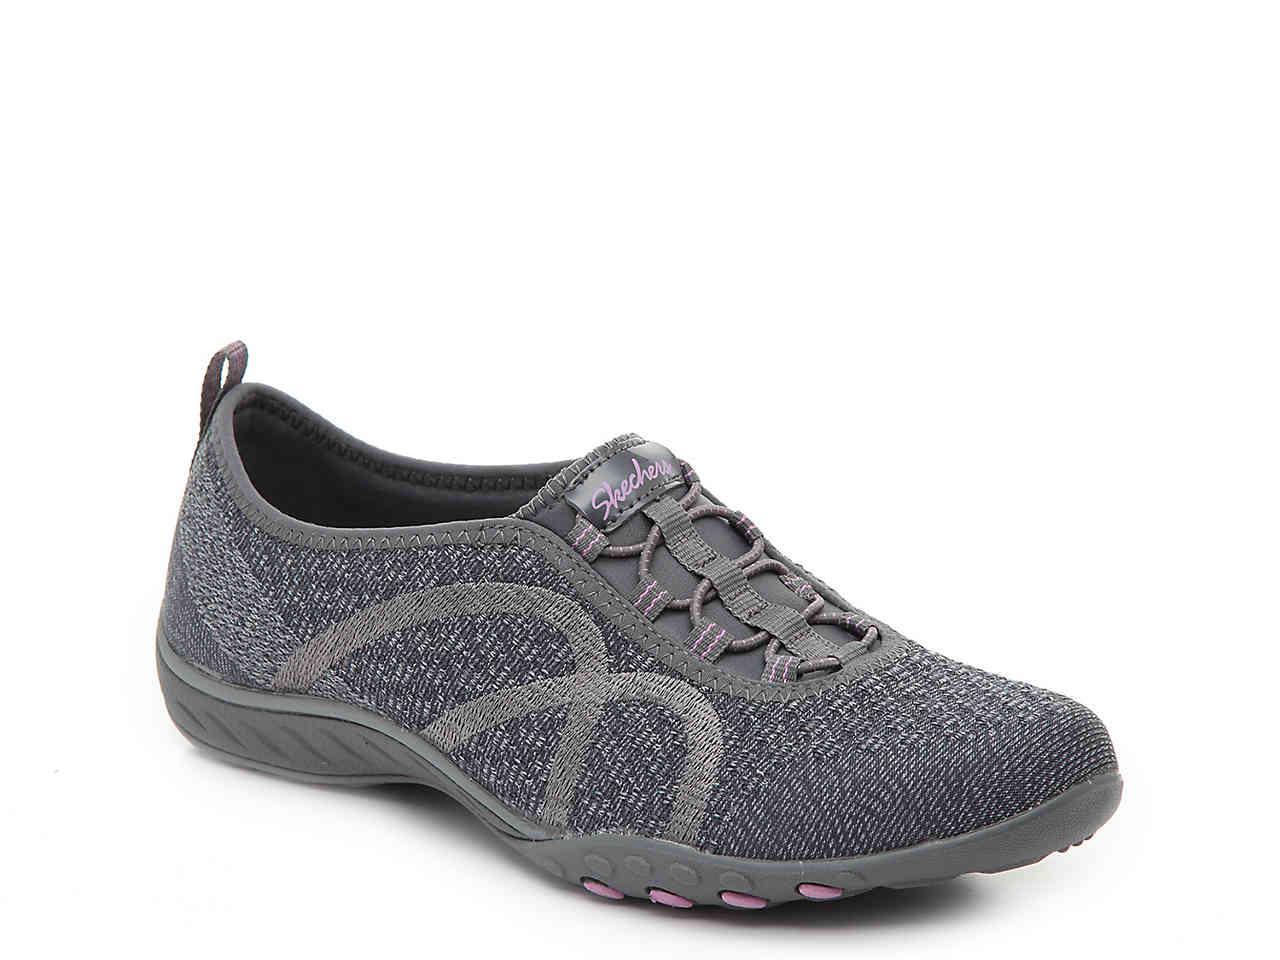 Lyst - Skechers Fortune Slip-on Sneaker in Gray c3cf6320c9